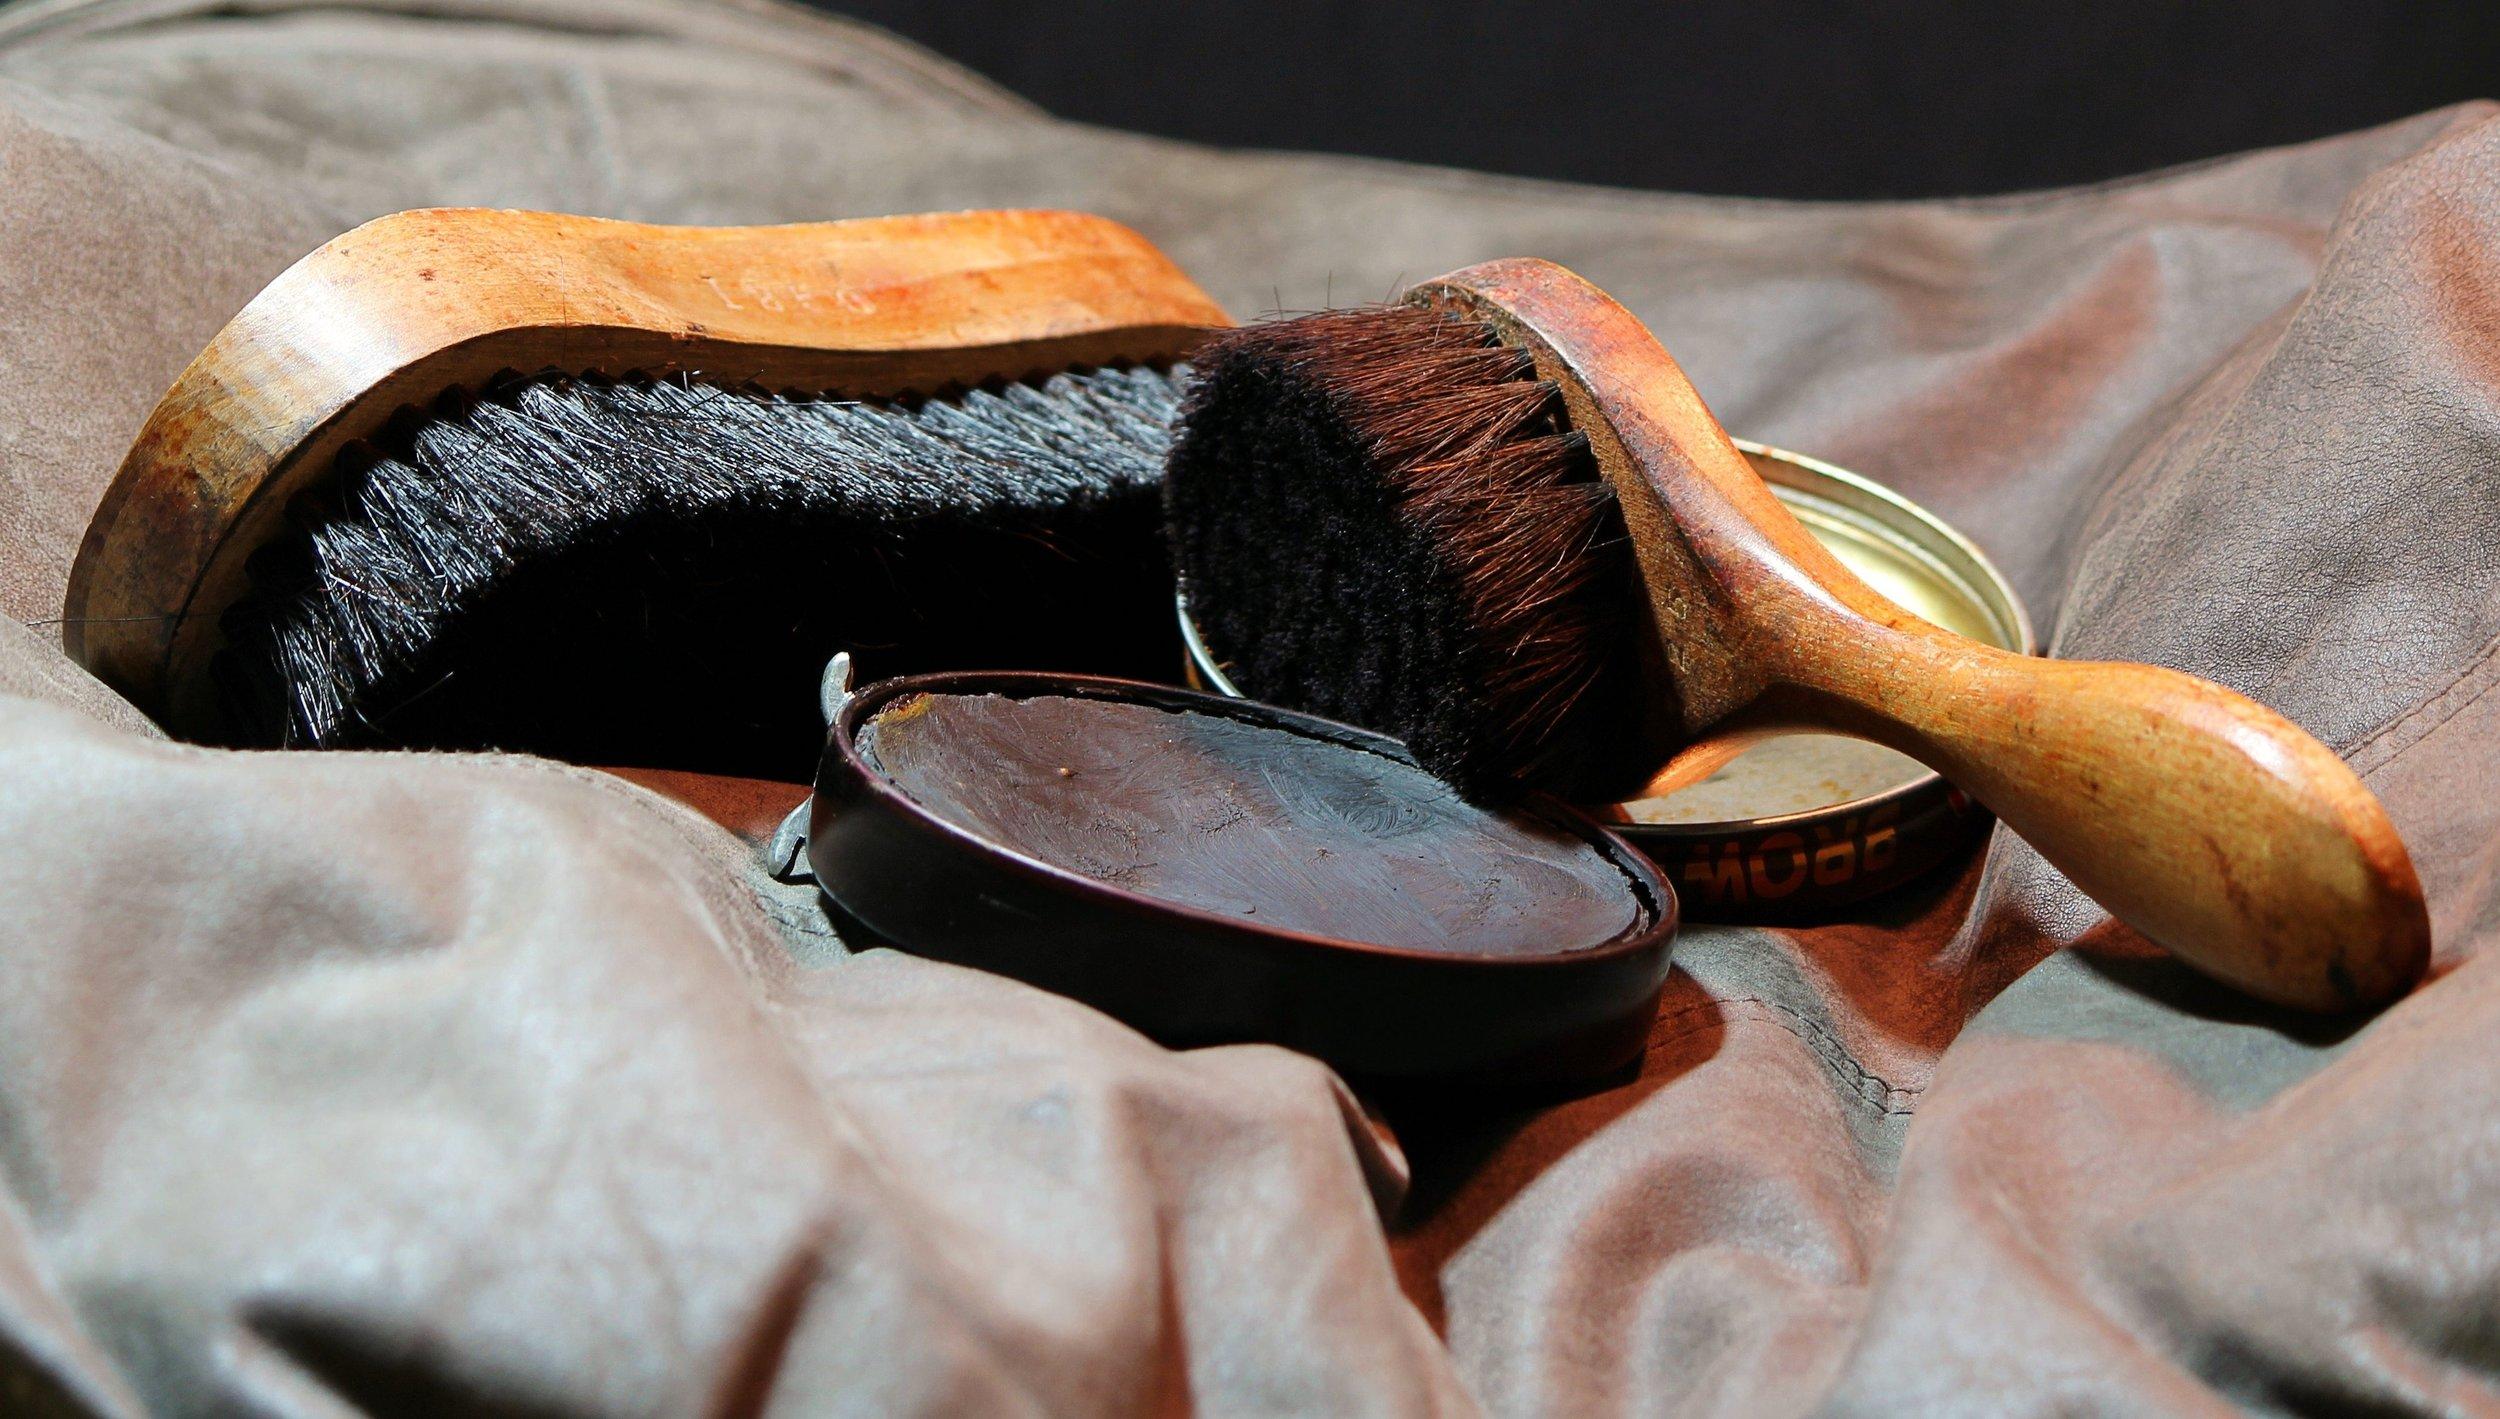 shoeshine-72477.jpg